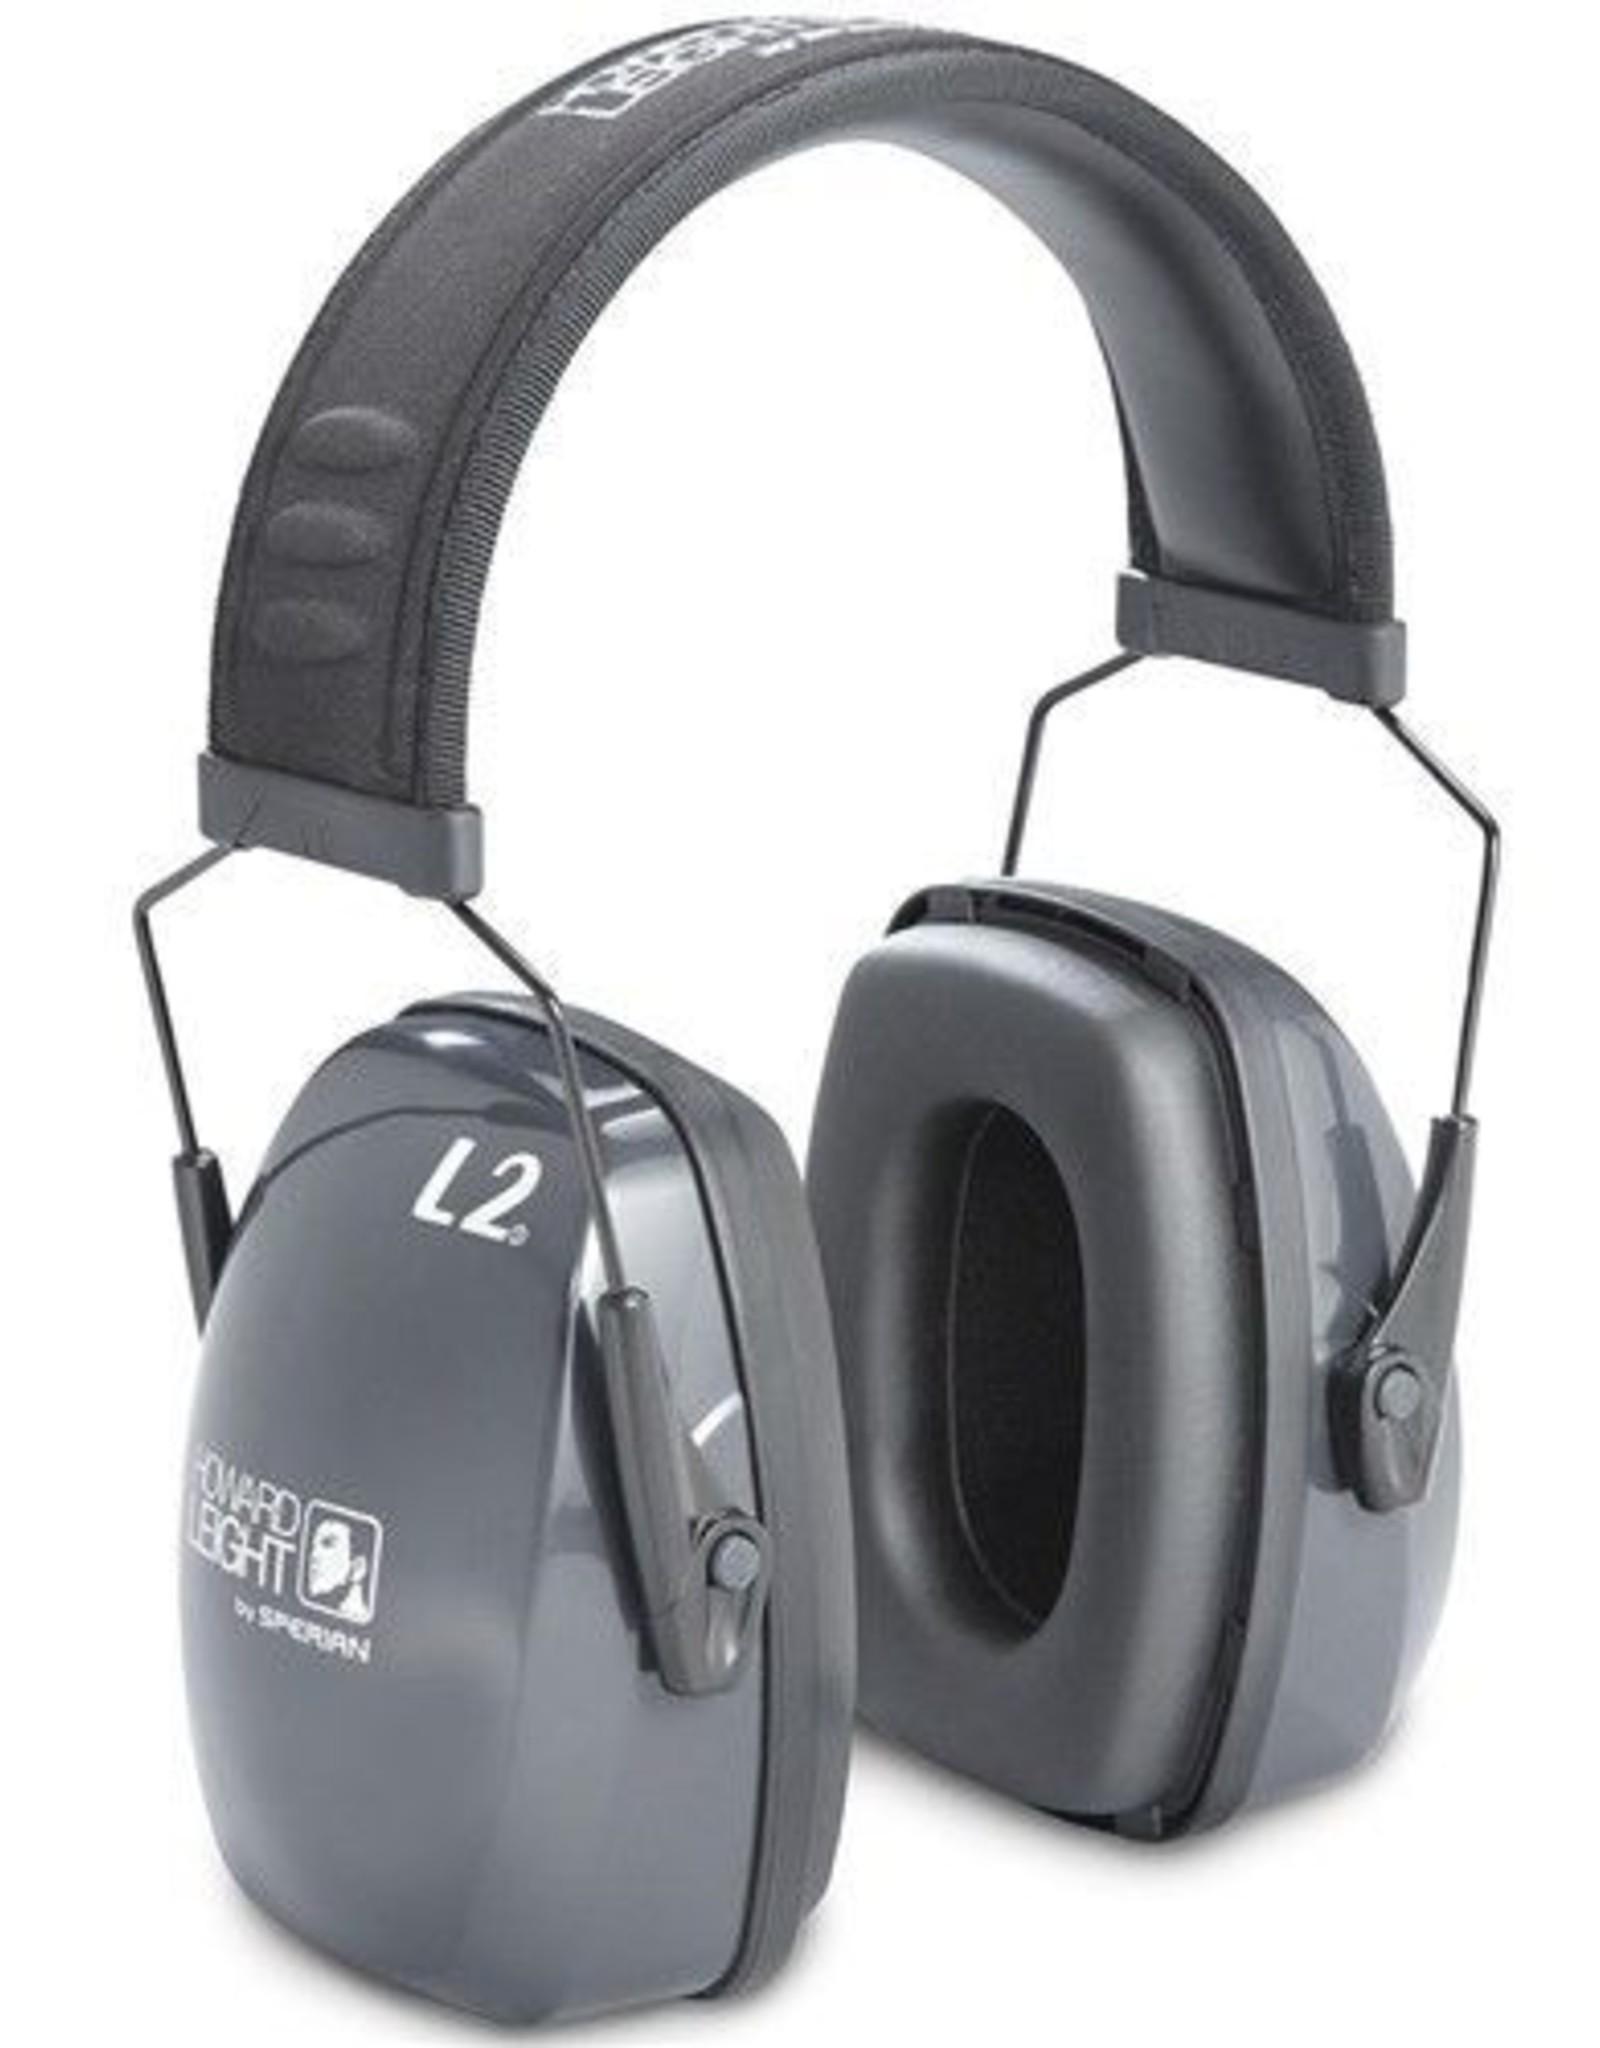 Howard Leight Howard Leight Leightning L2 Headband Earmuff 31dB Class 5